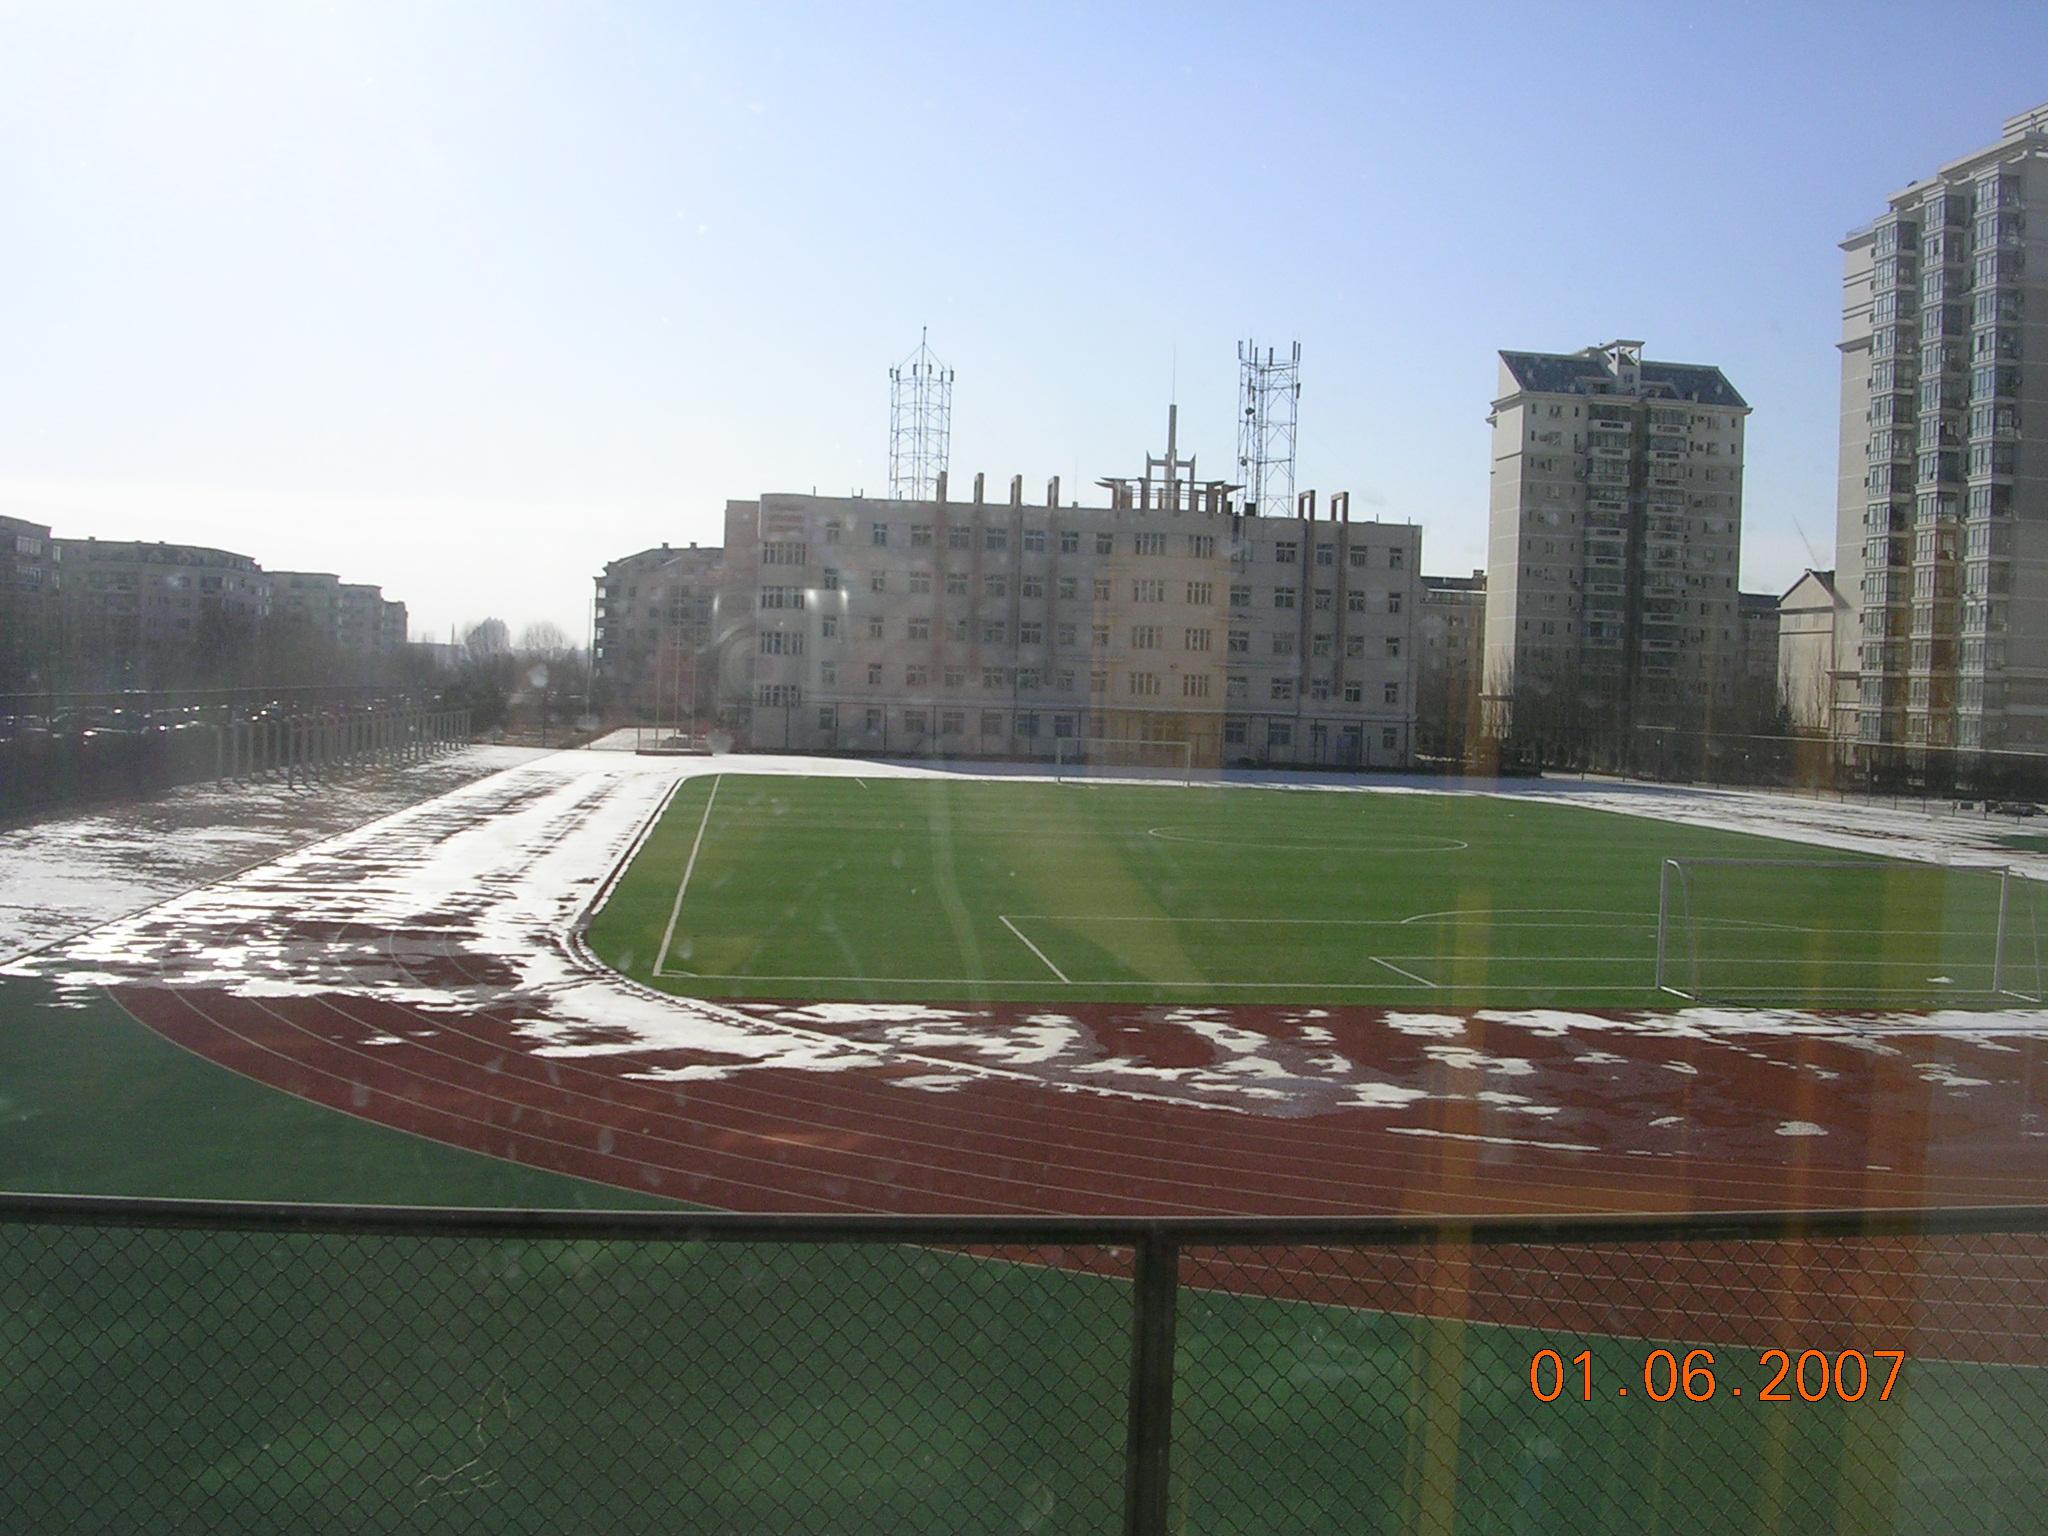 2007-1-10A 004.jpg